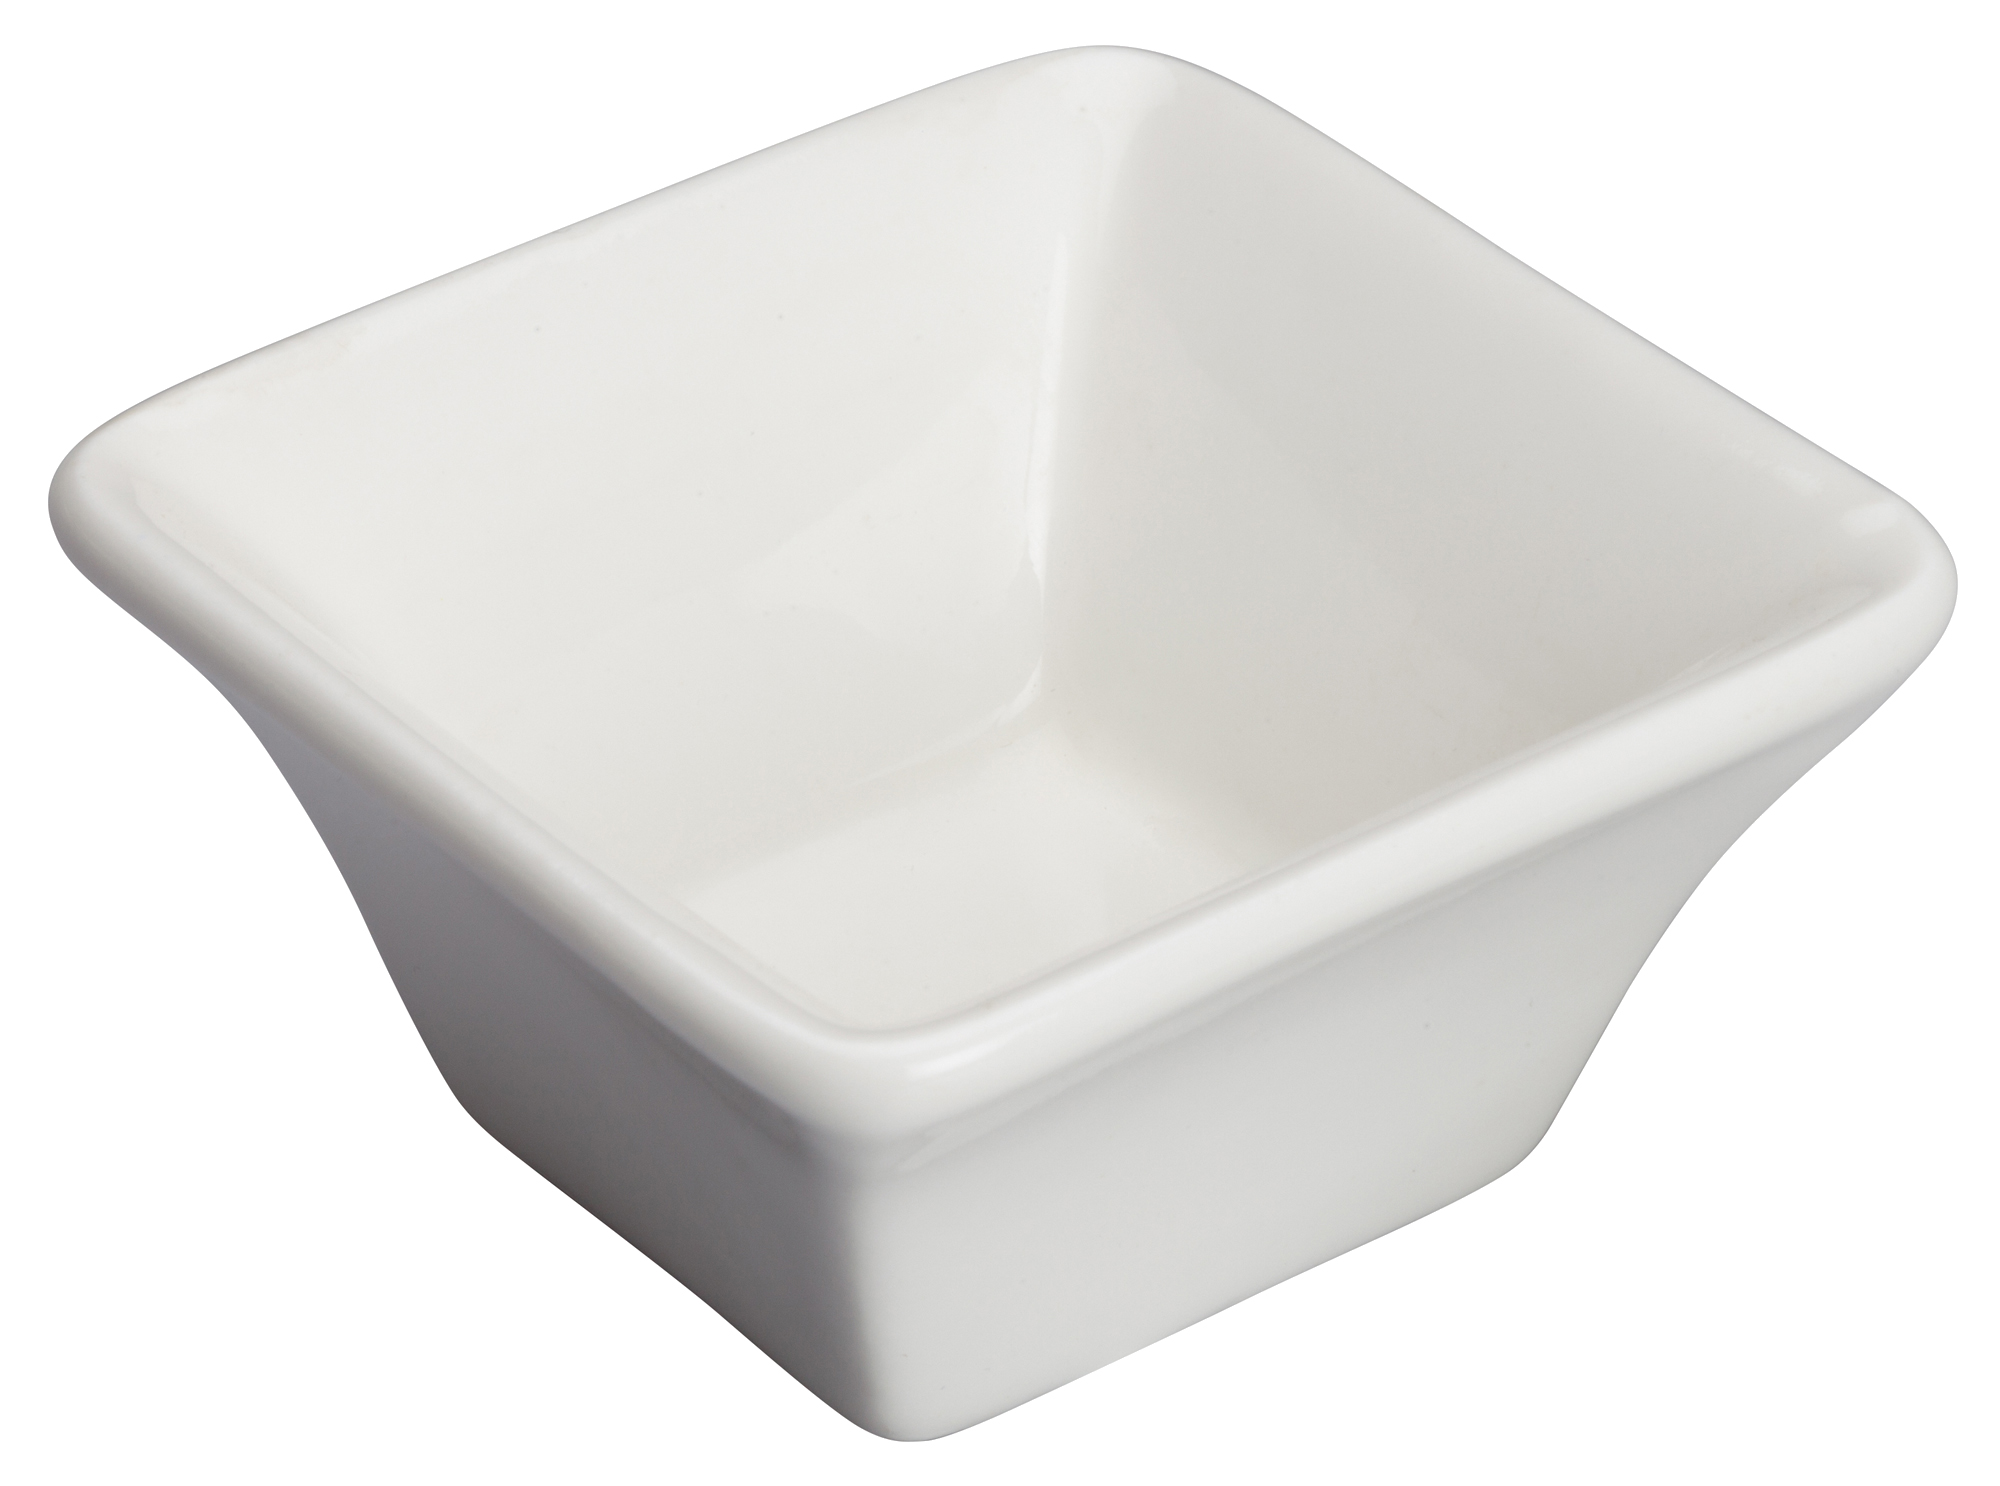 Winco WDP021-104 china, bowl,  0 - 8 oz